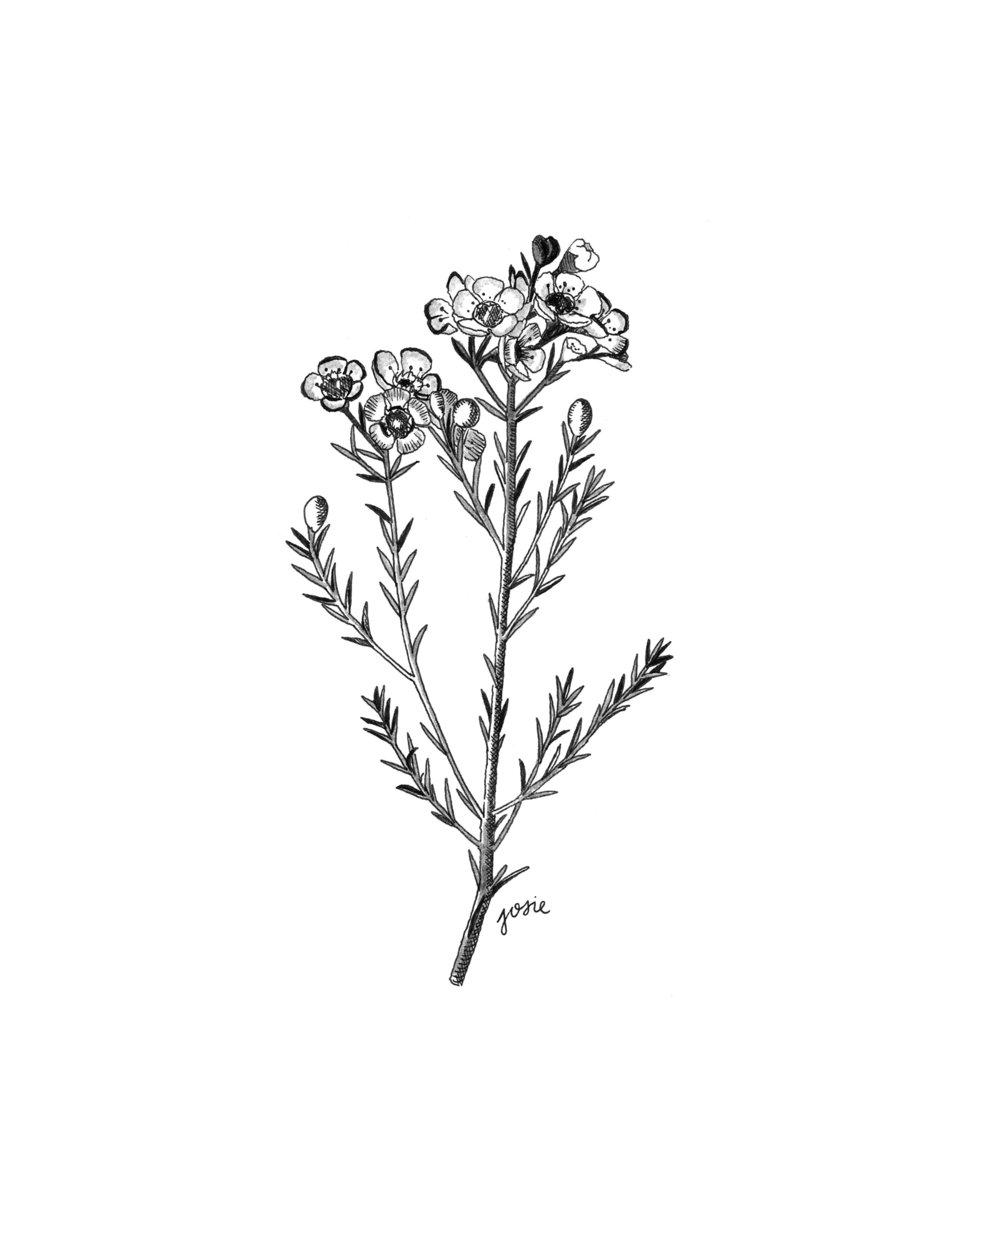 Floralsmain.jpg